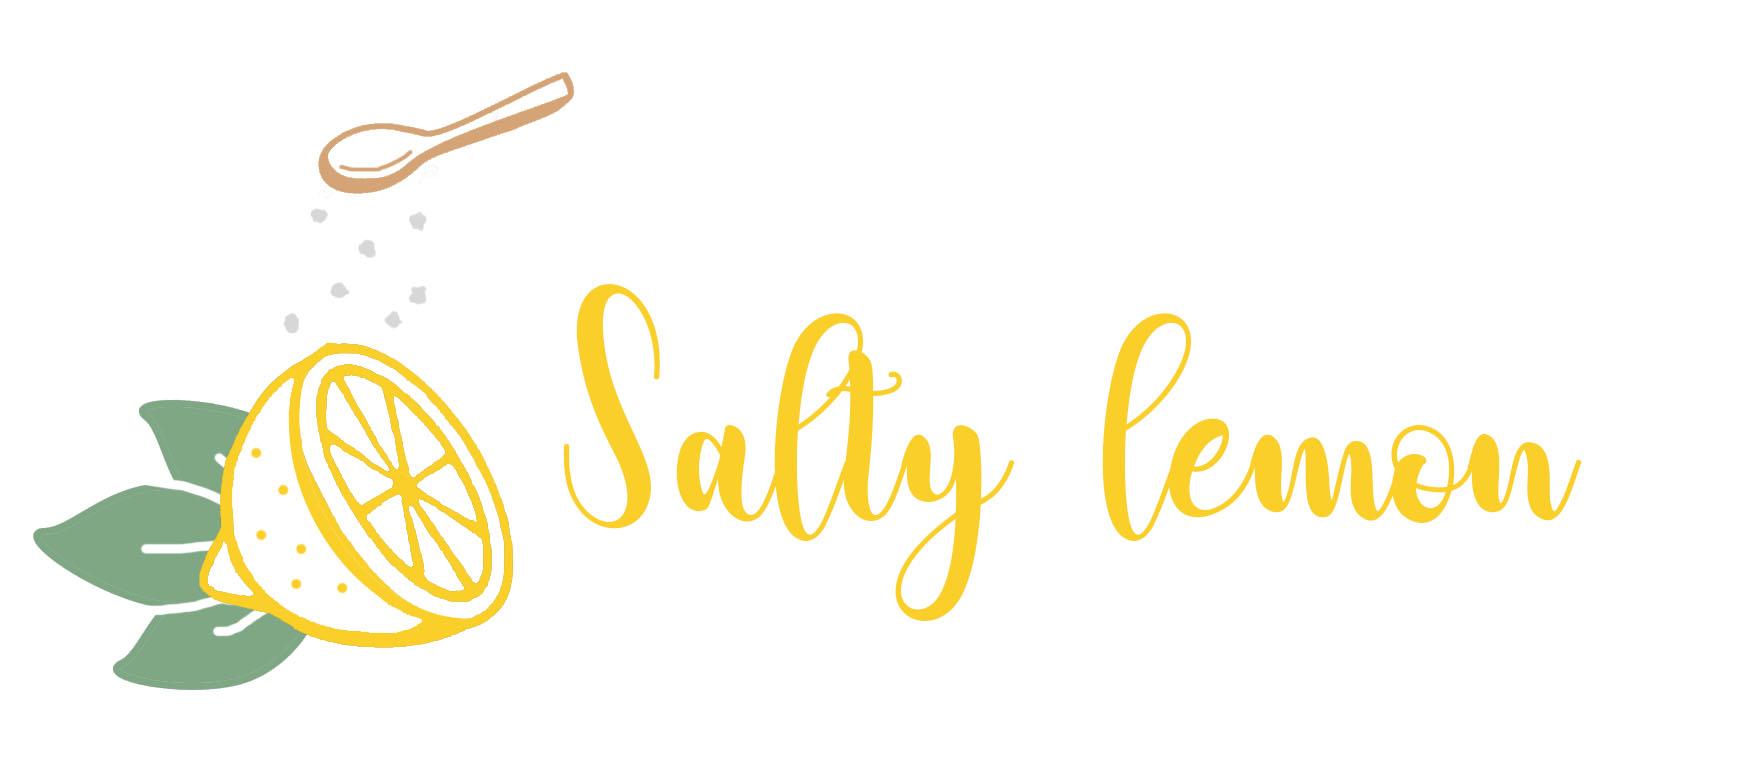 Salty lemon